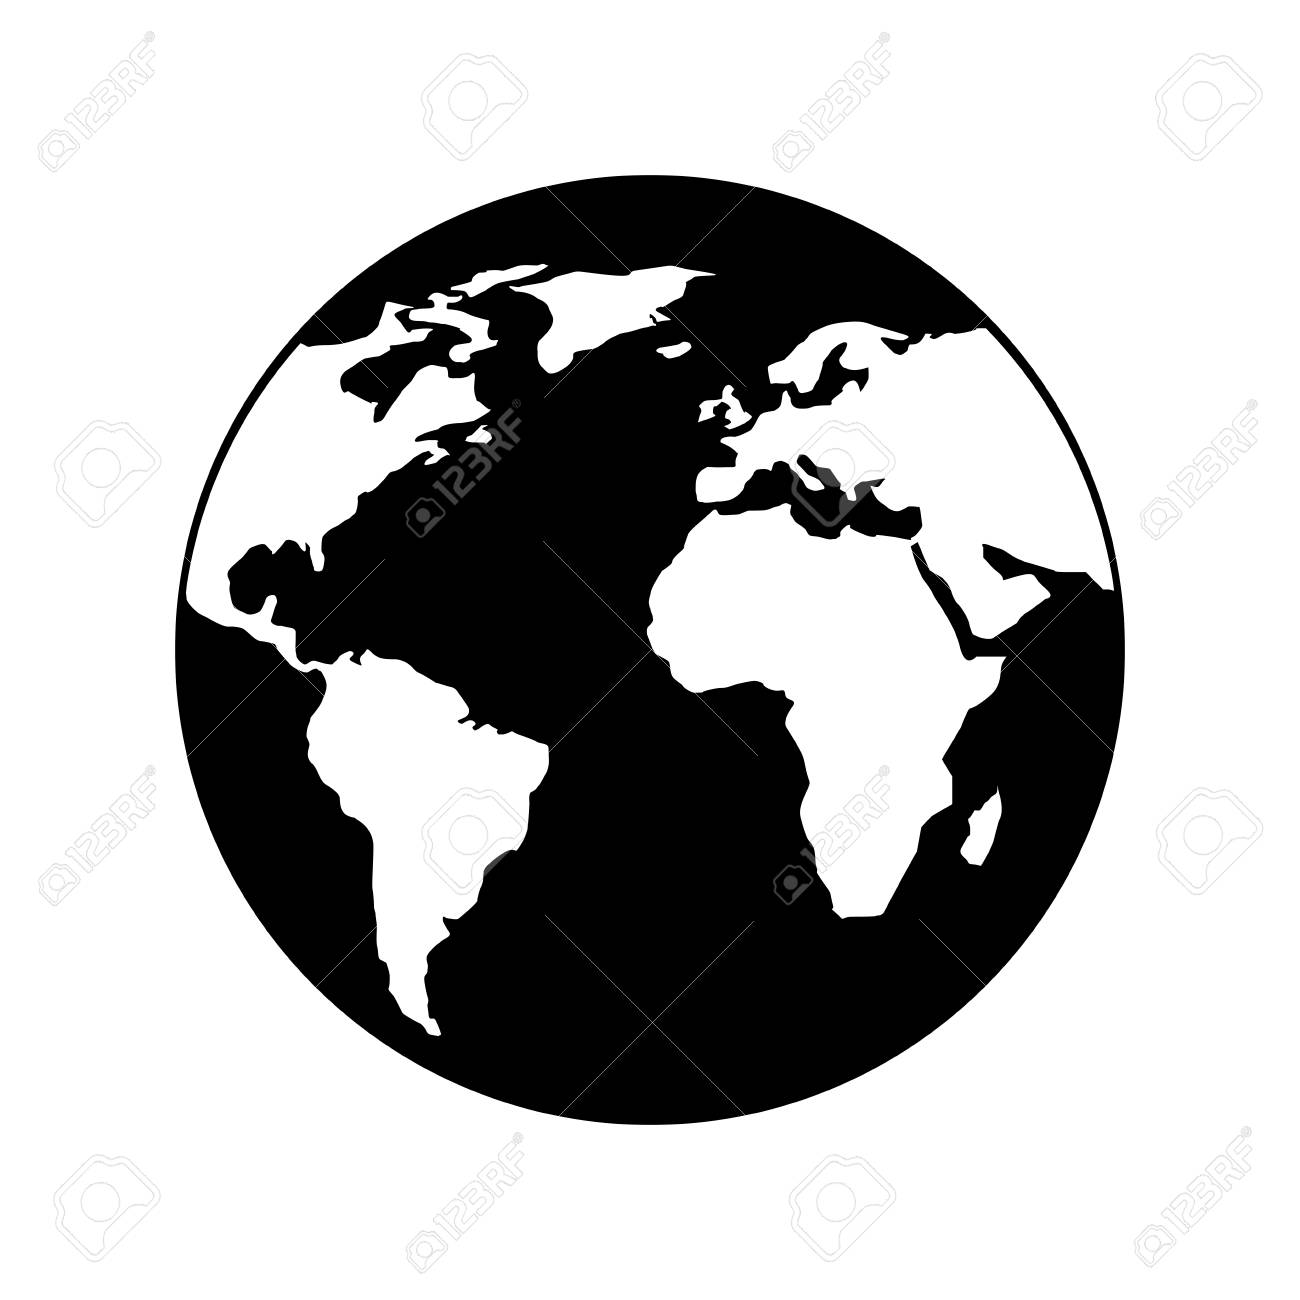 globe world earth planet map icon vector illustration black and white design - 96155212